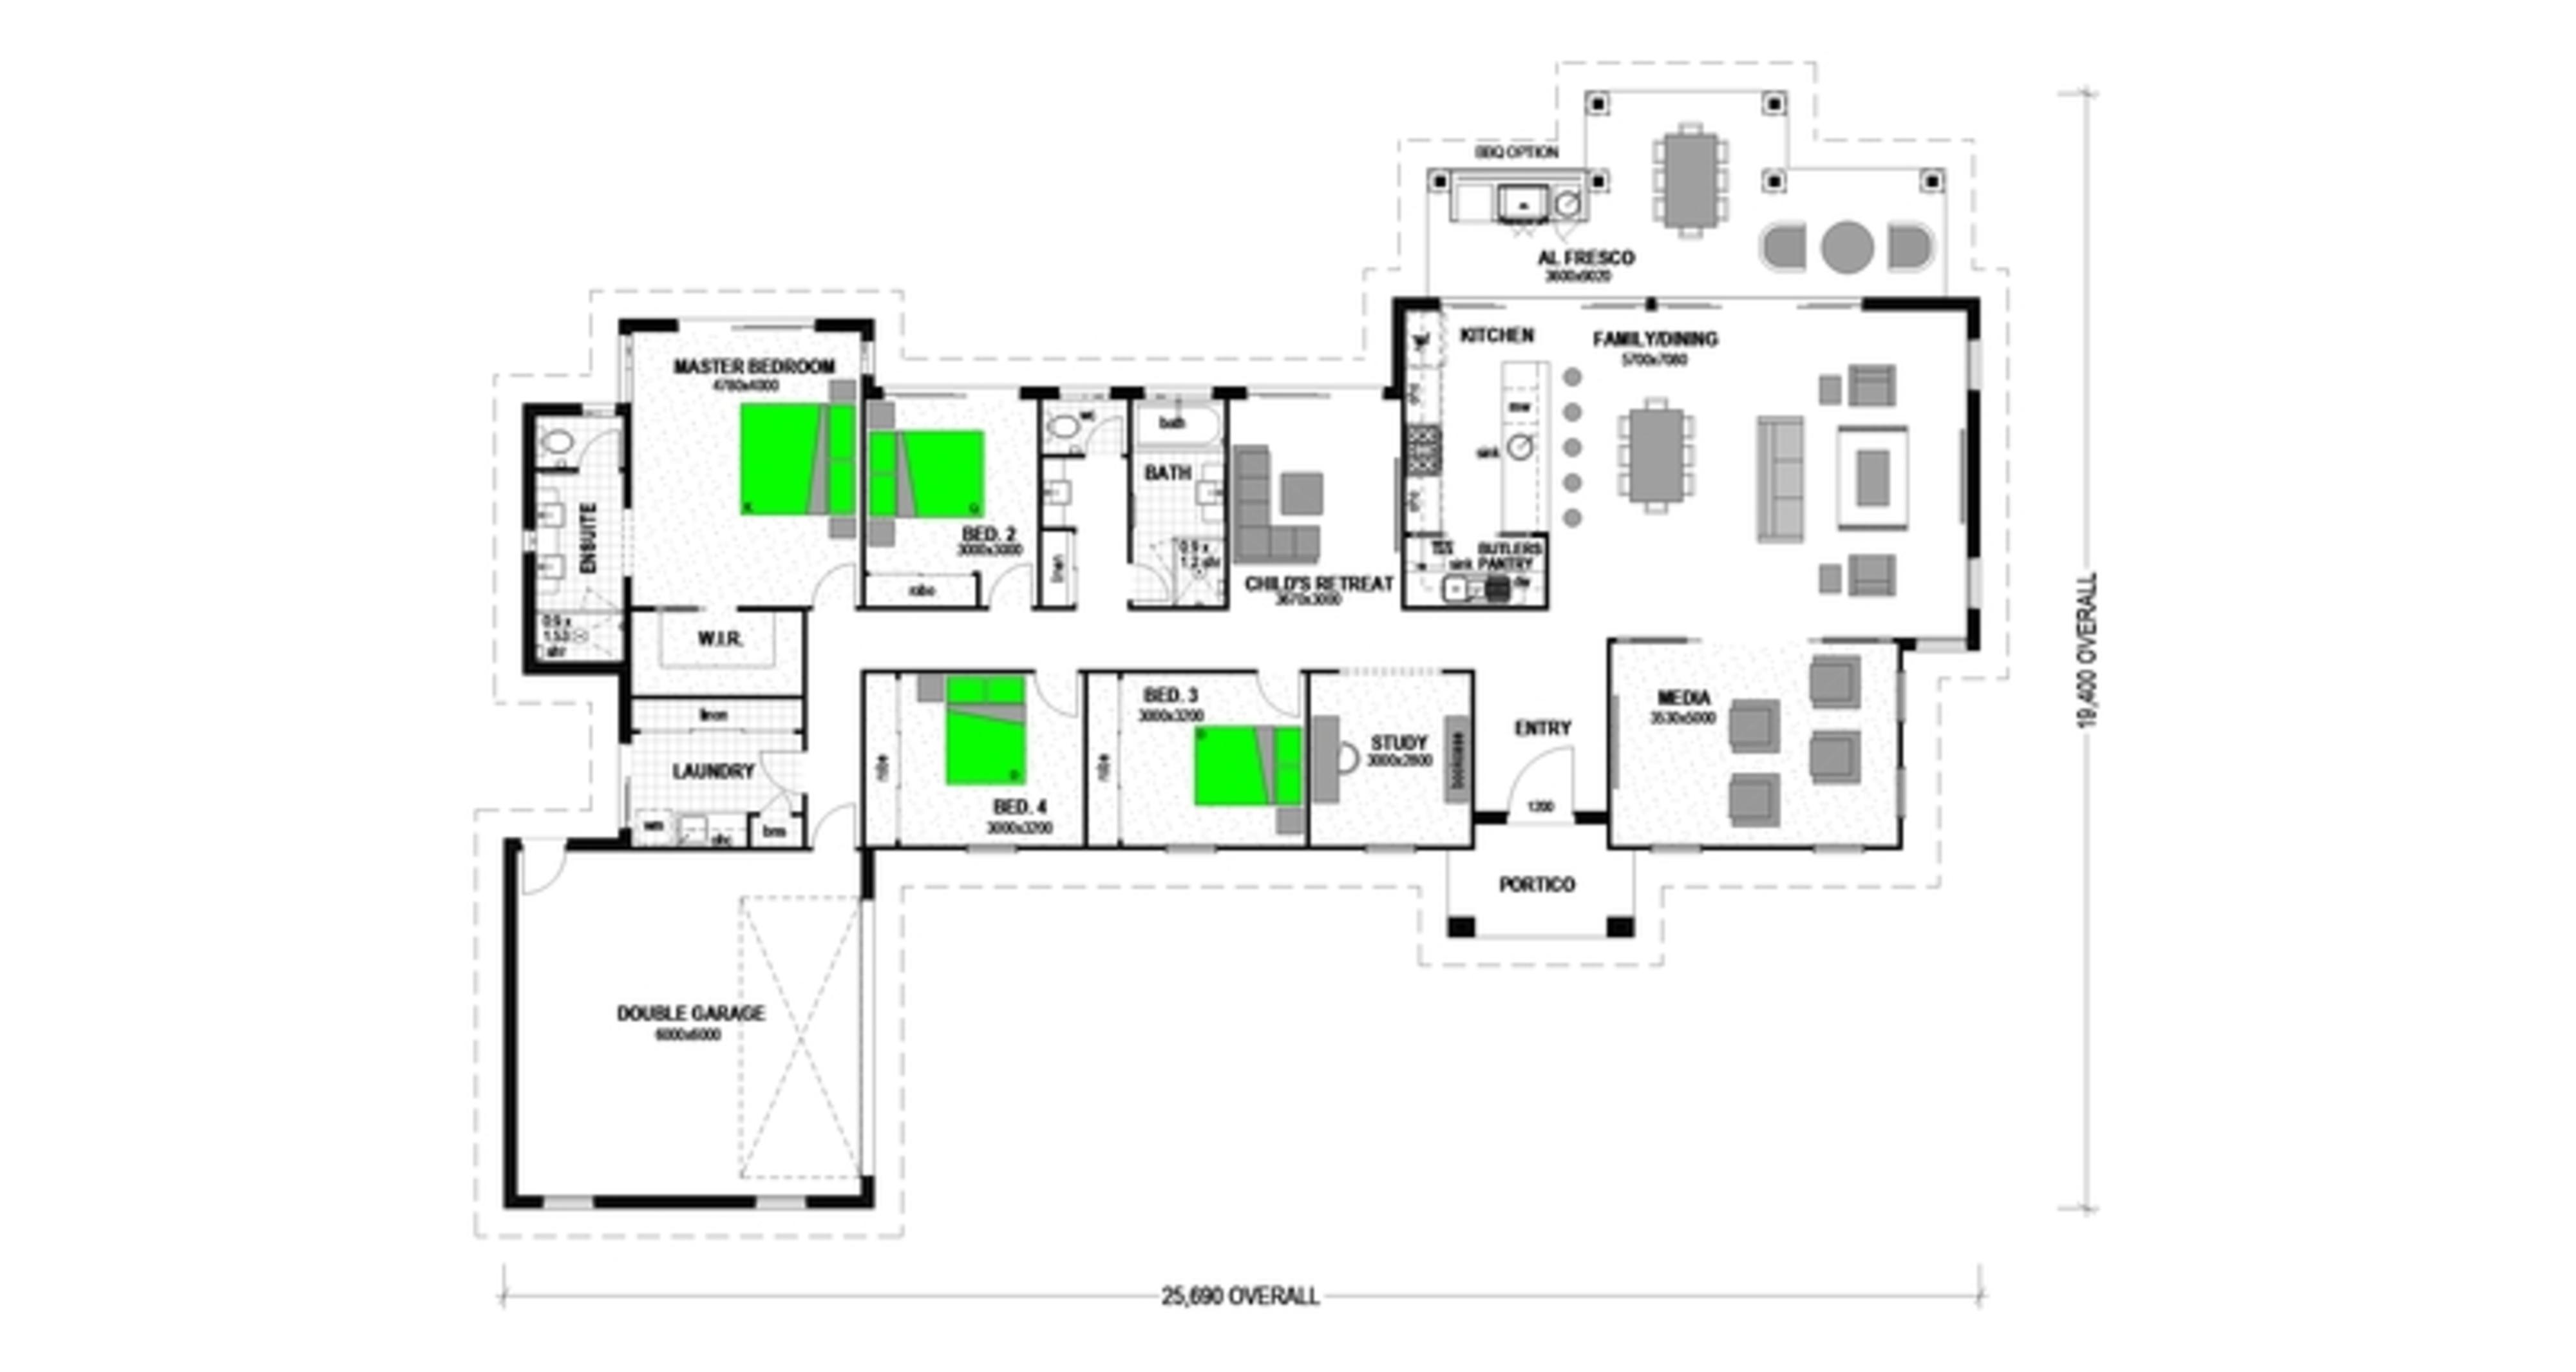 LOT 24 'COUNTRY HILLS ESTATE' MARBURG Floorplan